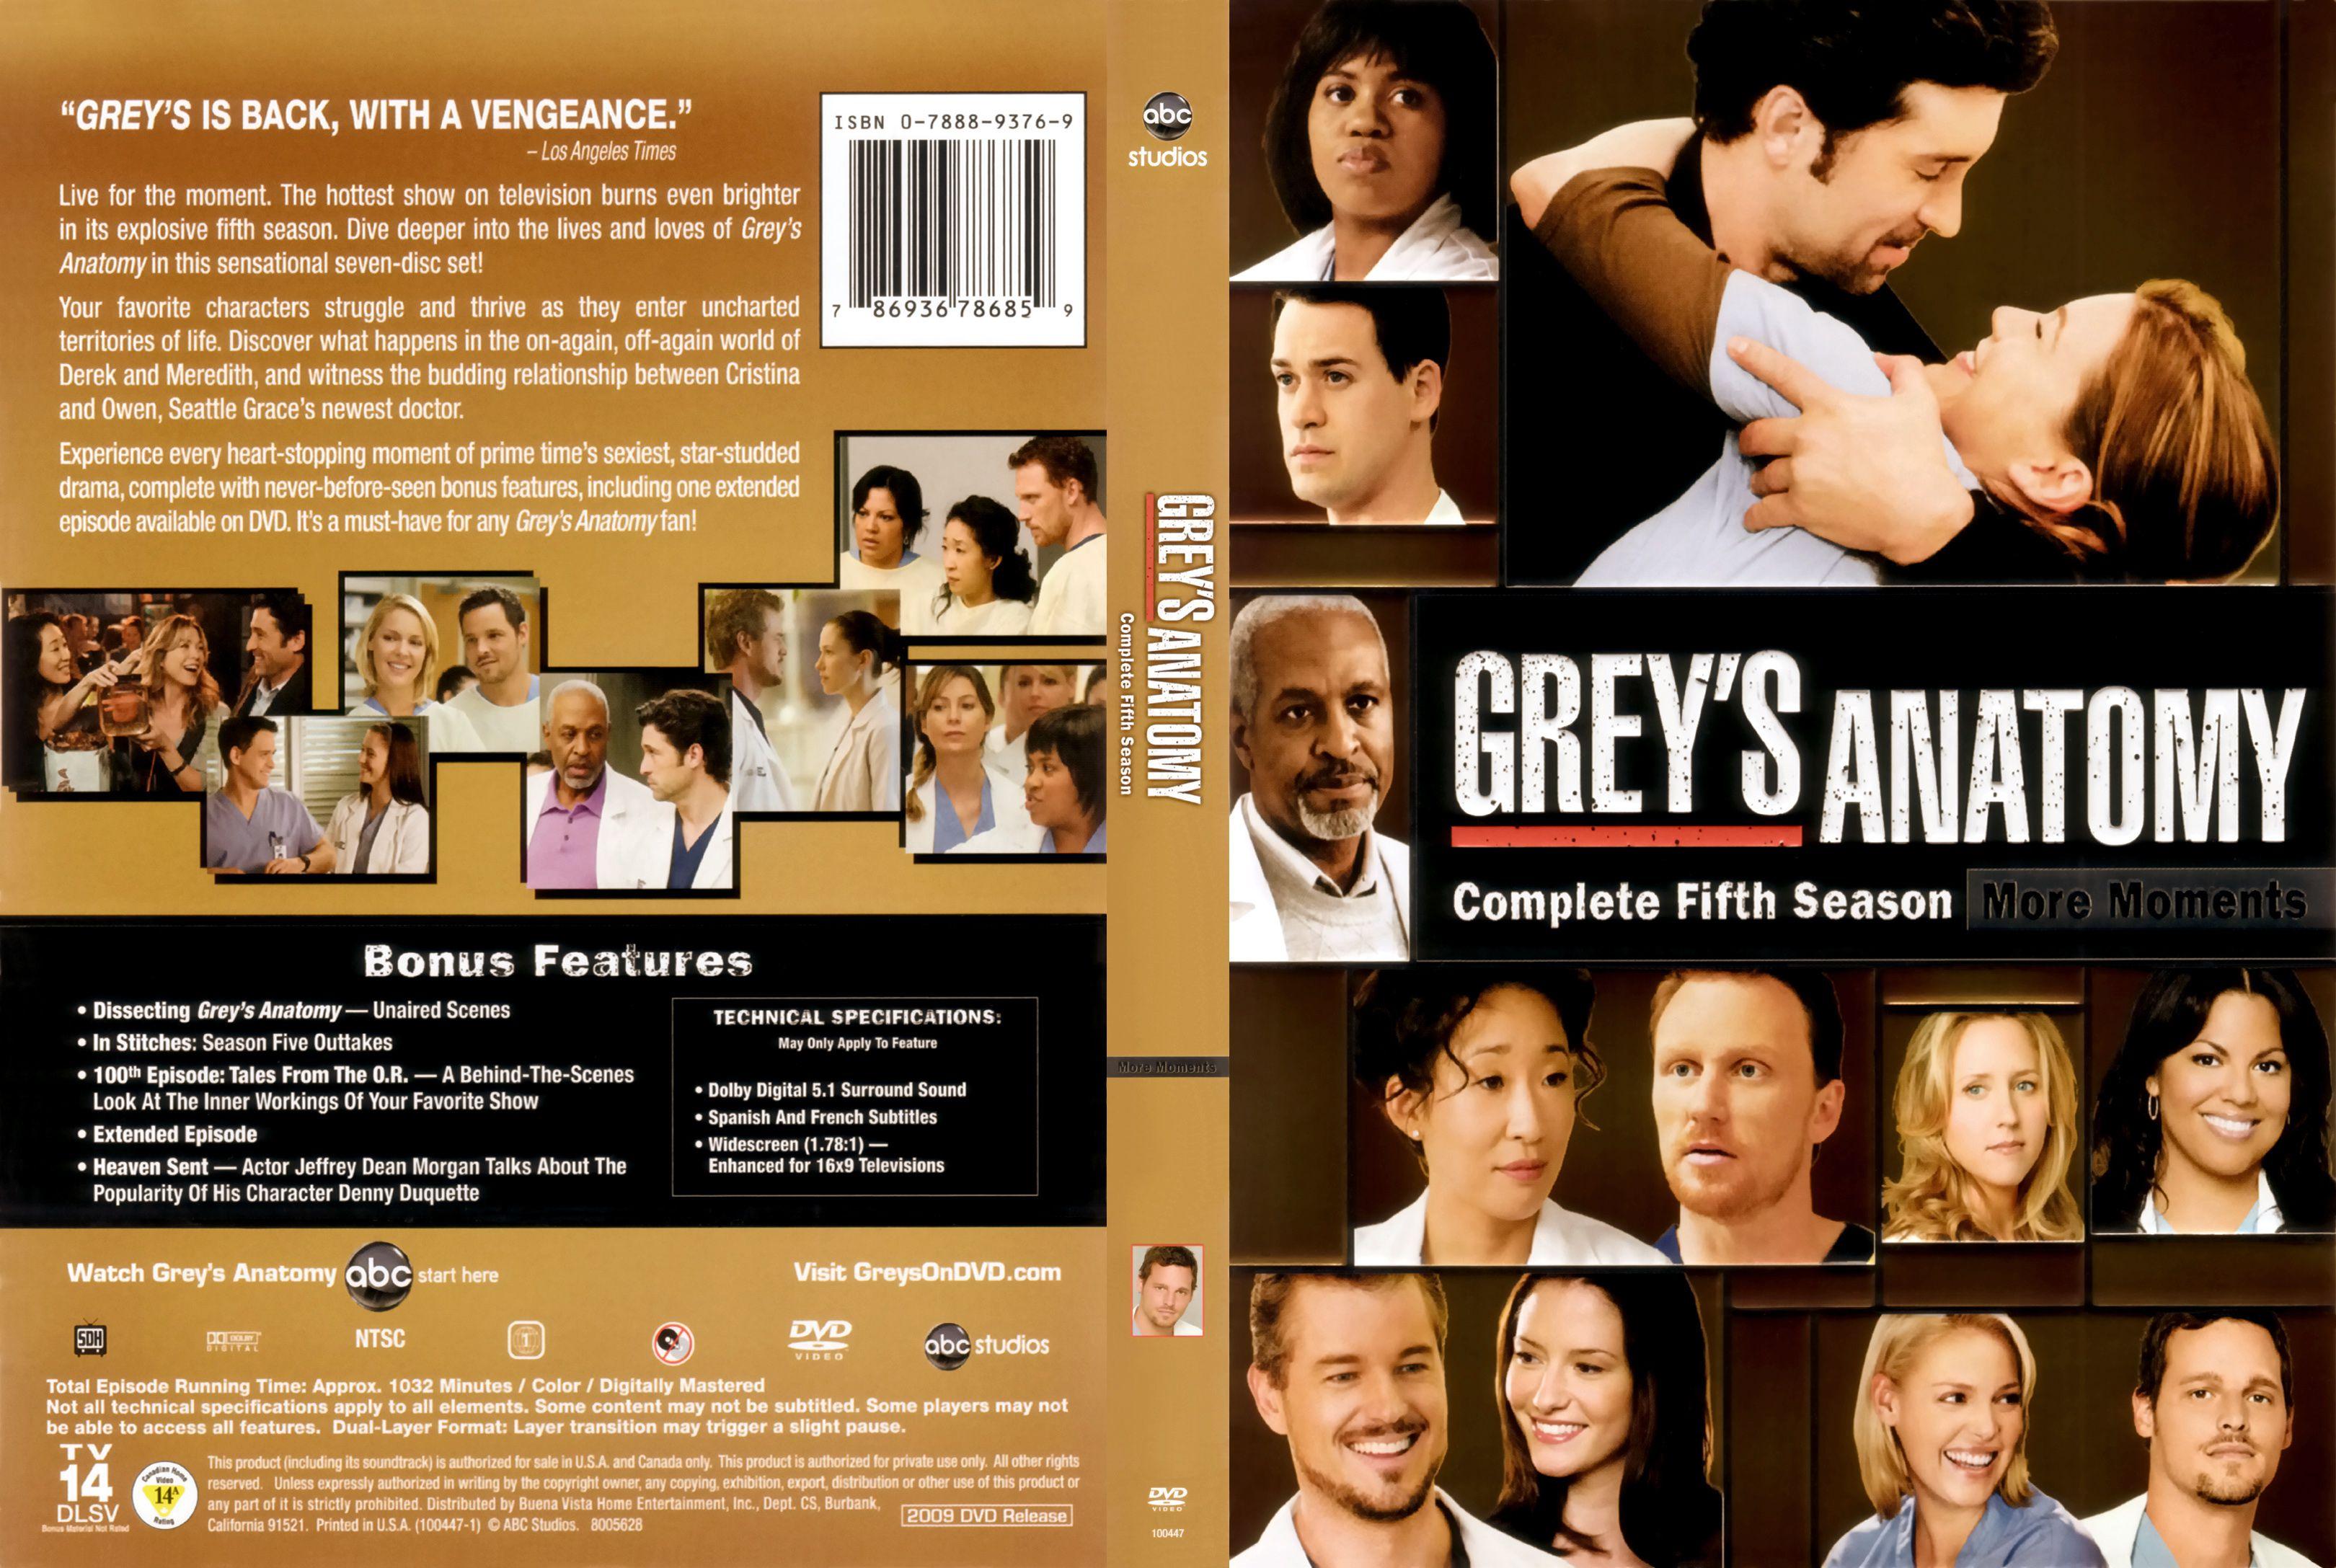 'Grey's Anatomy' Season 5 Episode Guide